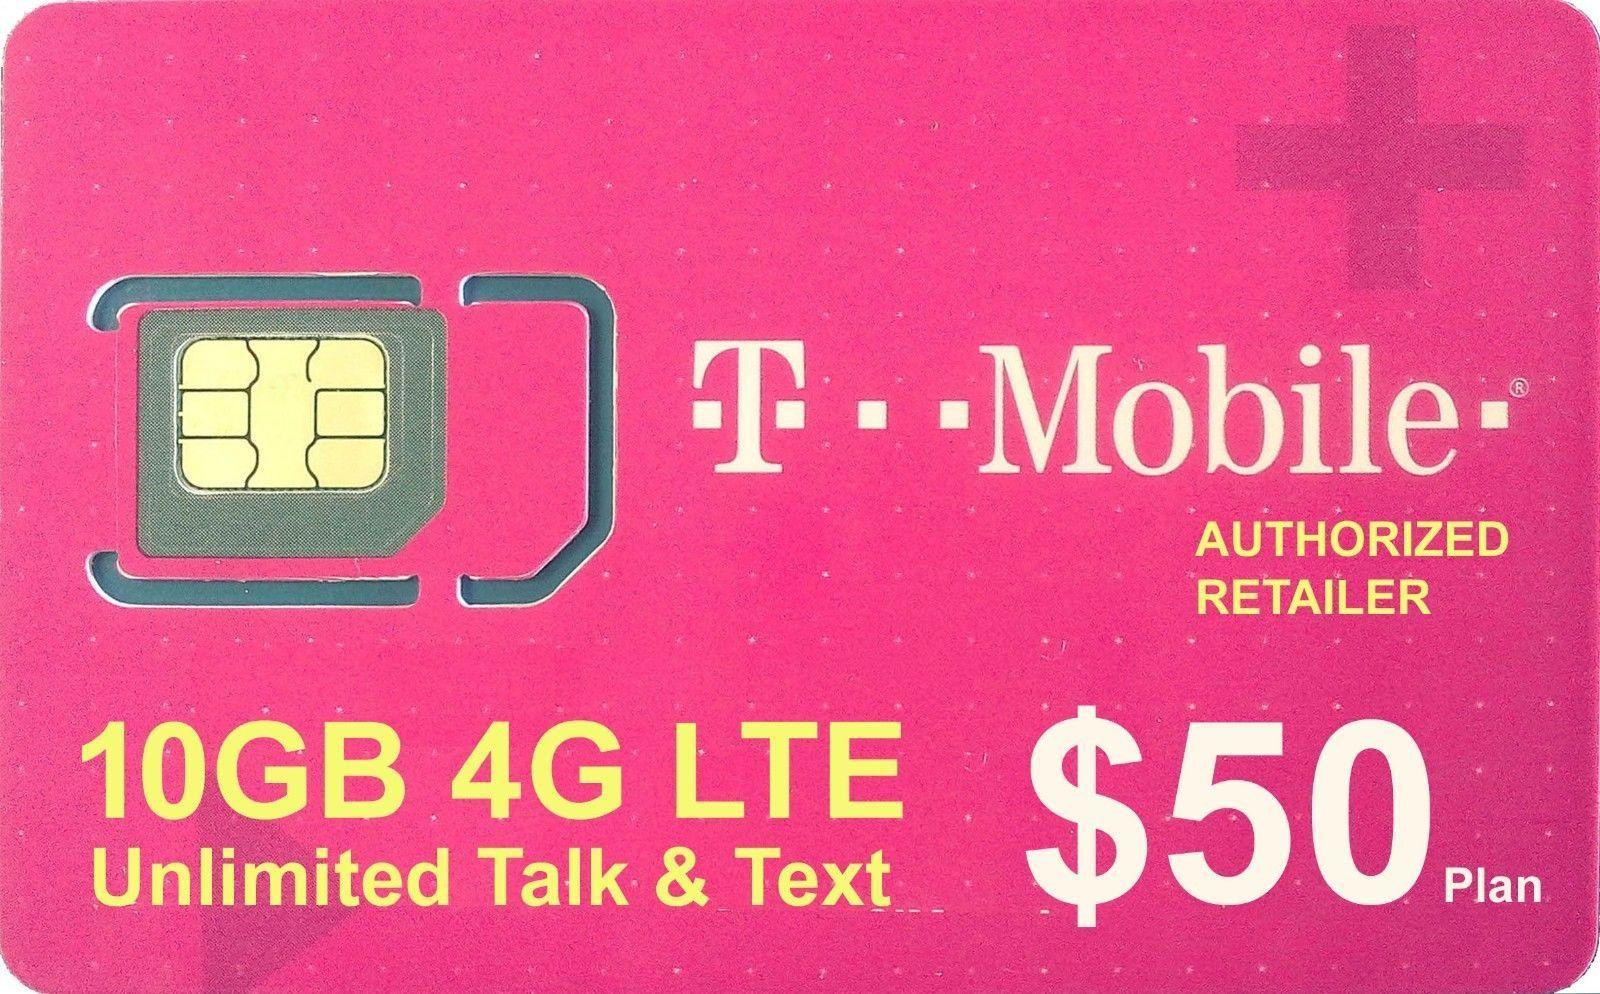 Preloaded tmobile sim card with prepaid plan 40 10gb 4g